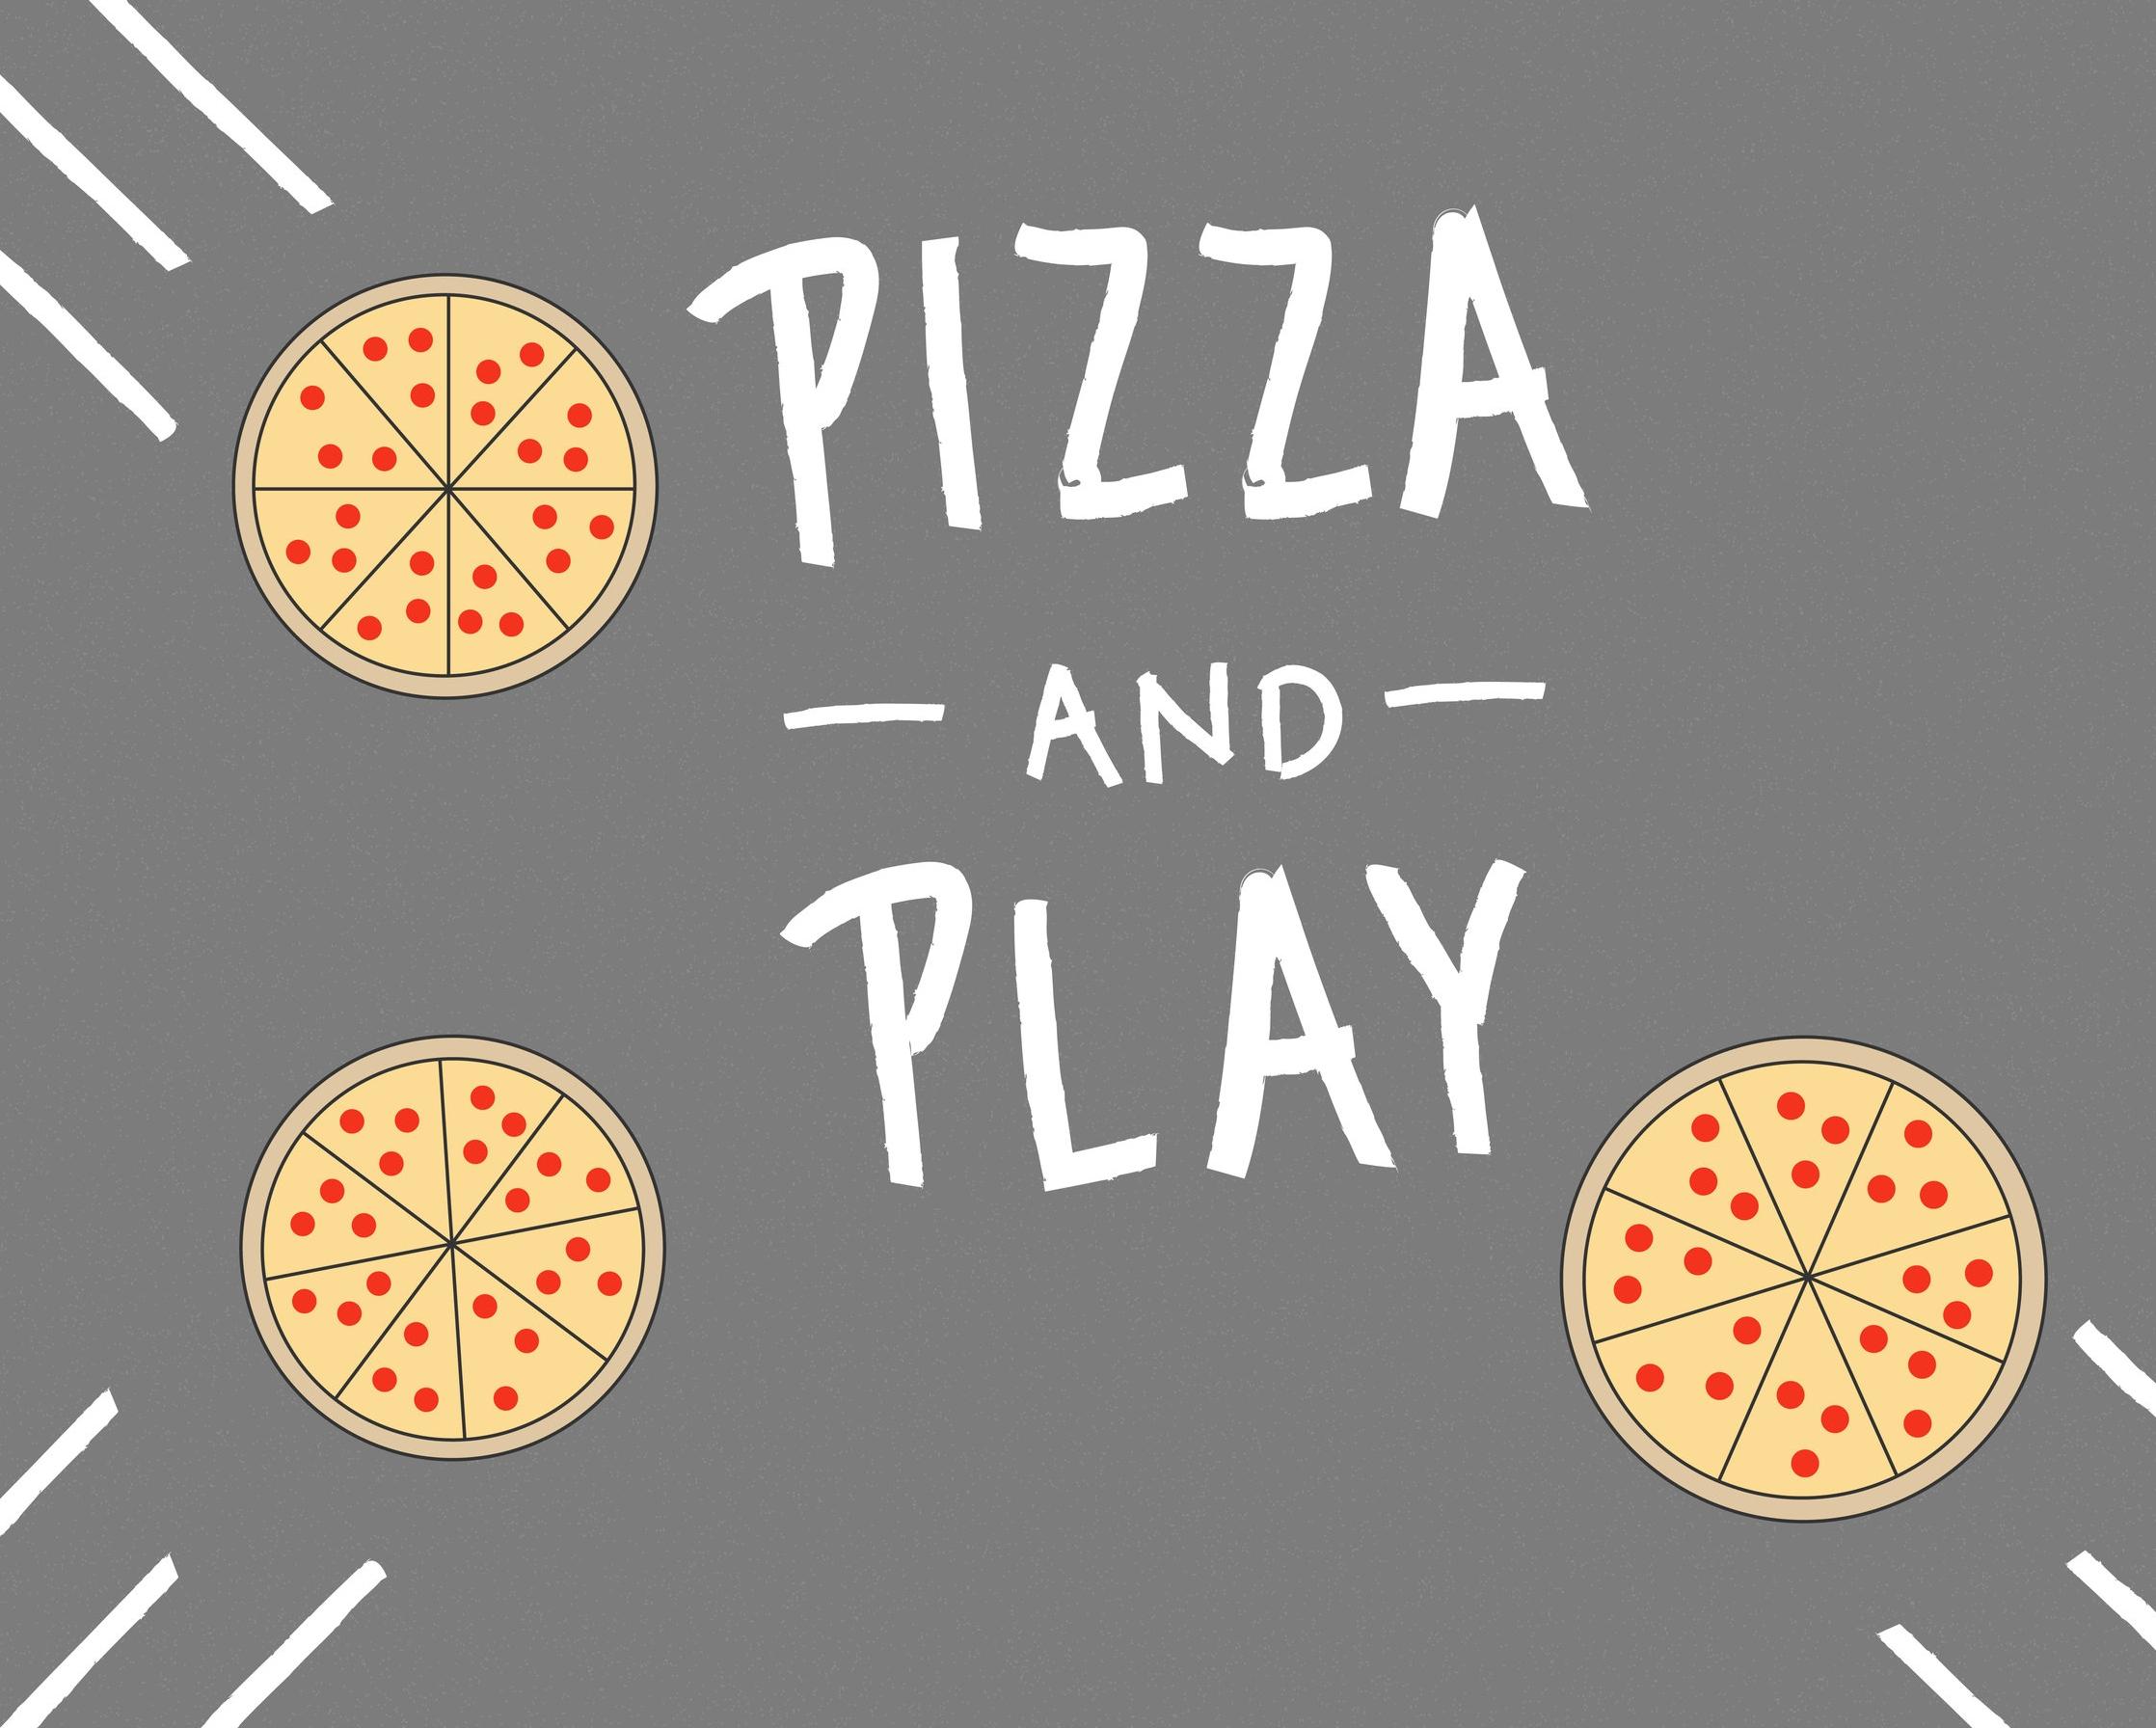 WIRC_Pizza_Play.jpg